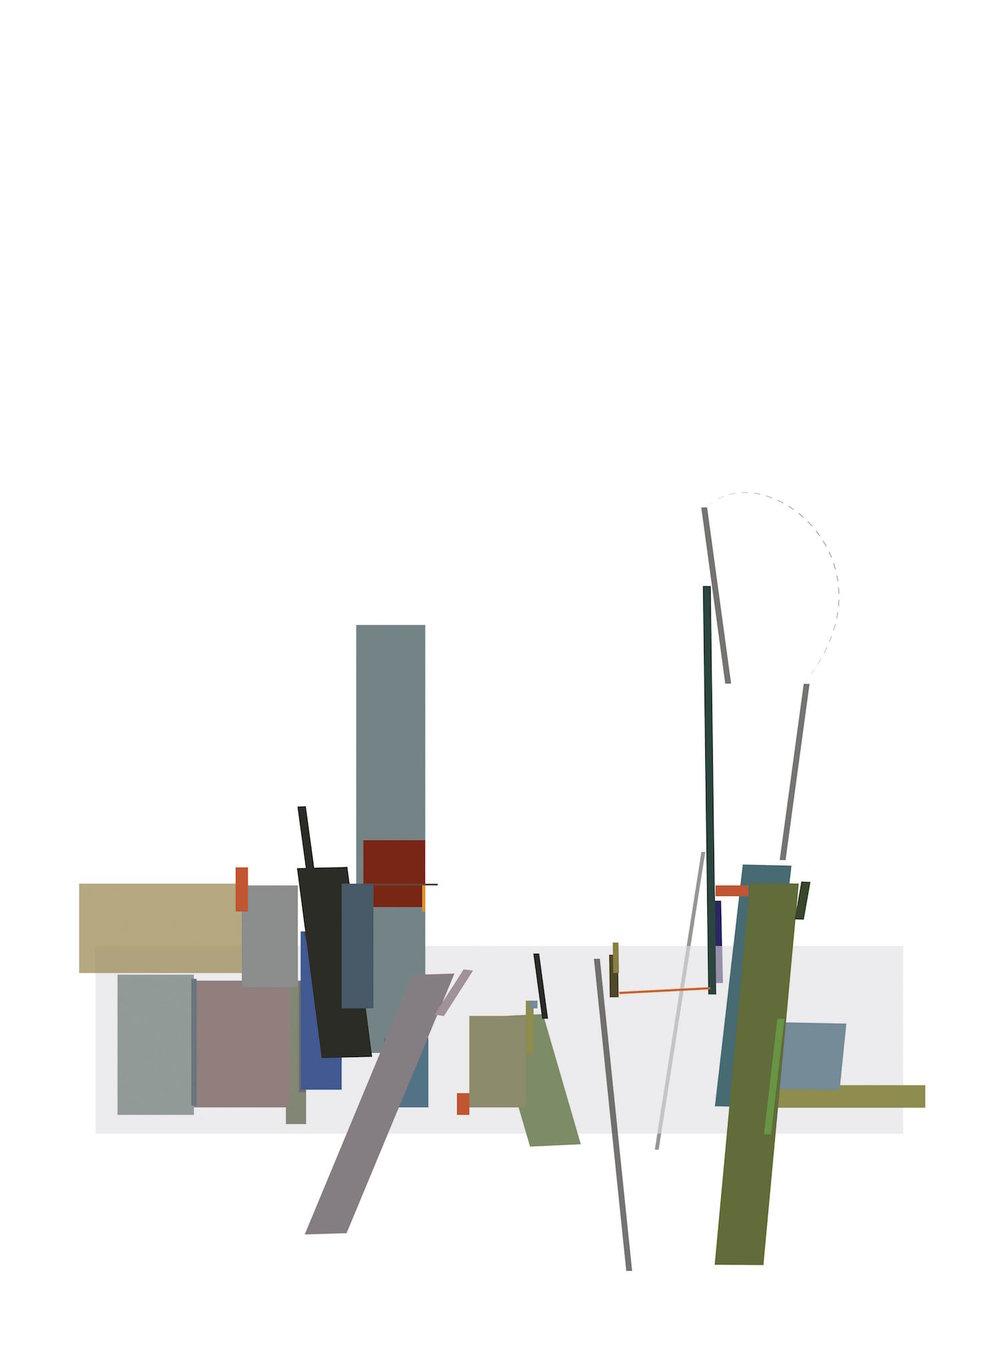 By Luisa Duarte. Archival Inkjet Print.